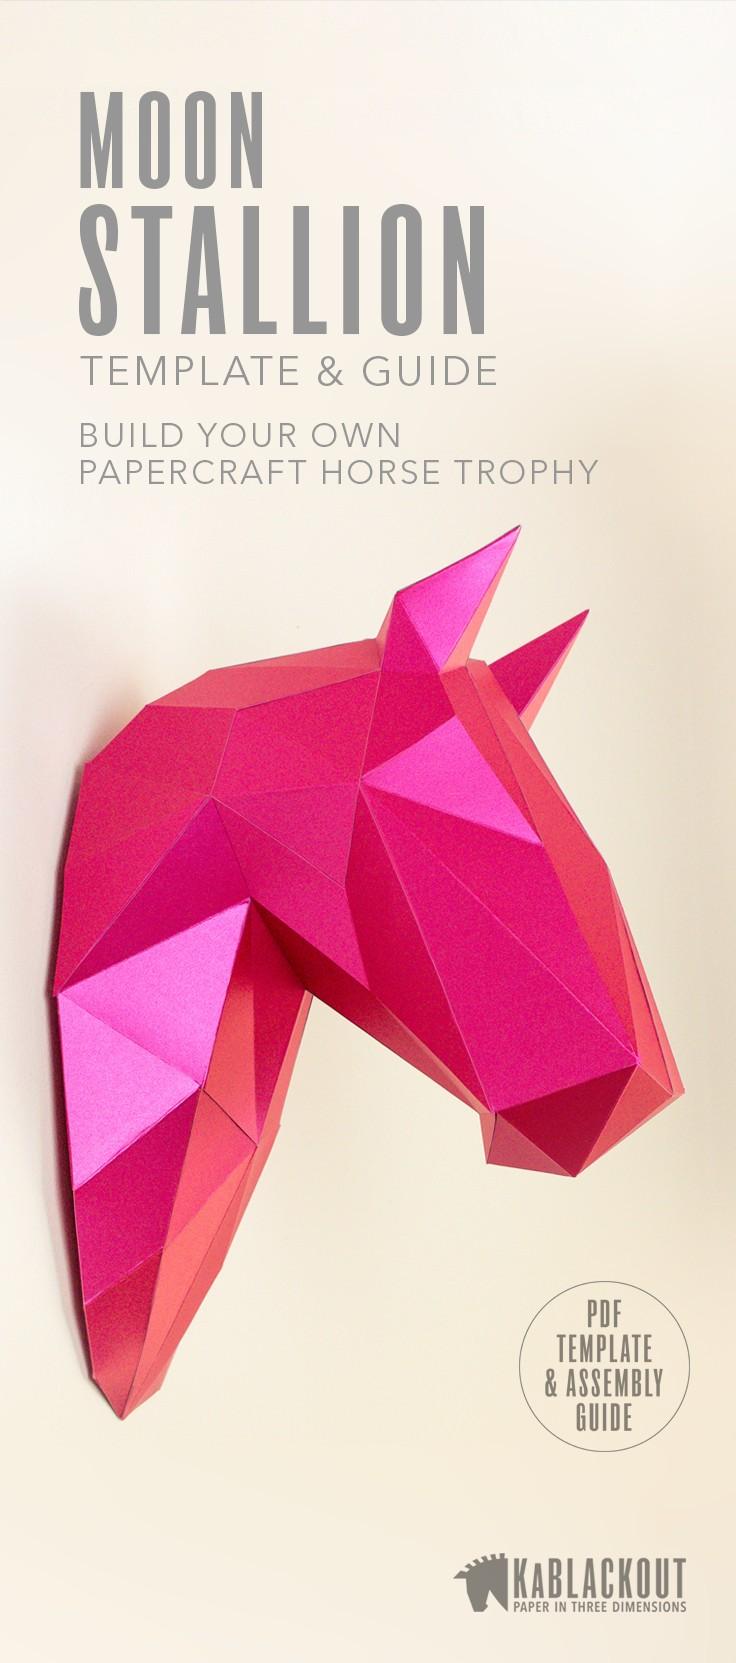 Papercraft 3d Horse Papercraft Diy Horse Template Low Poly Horse 3d Wall Trophy